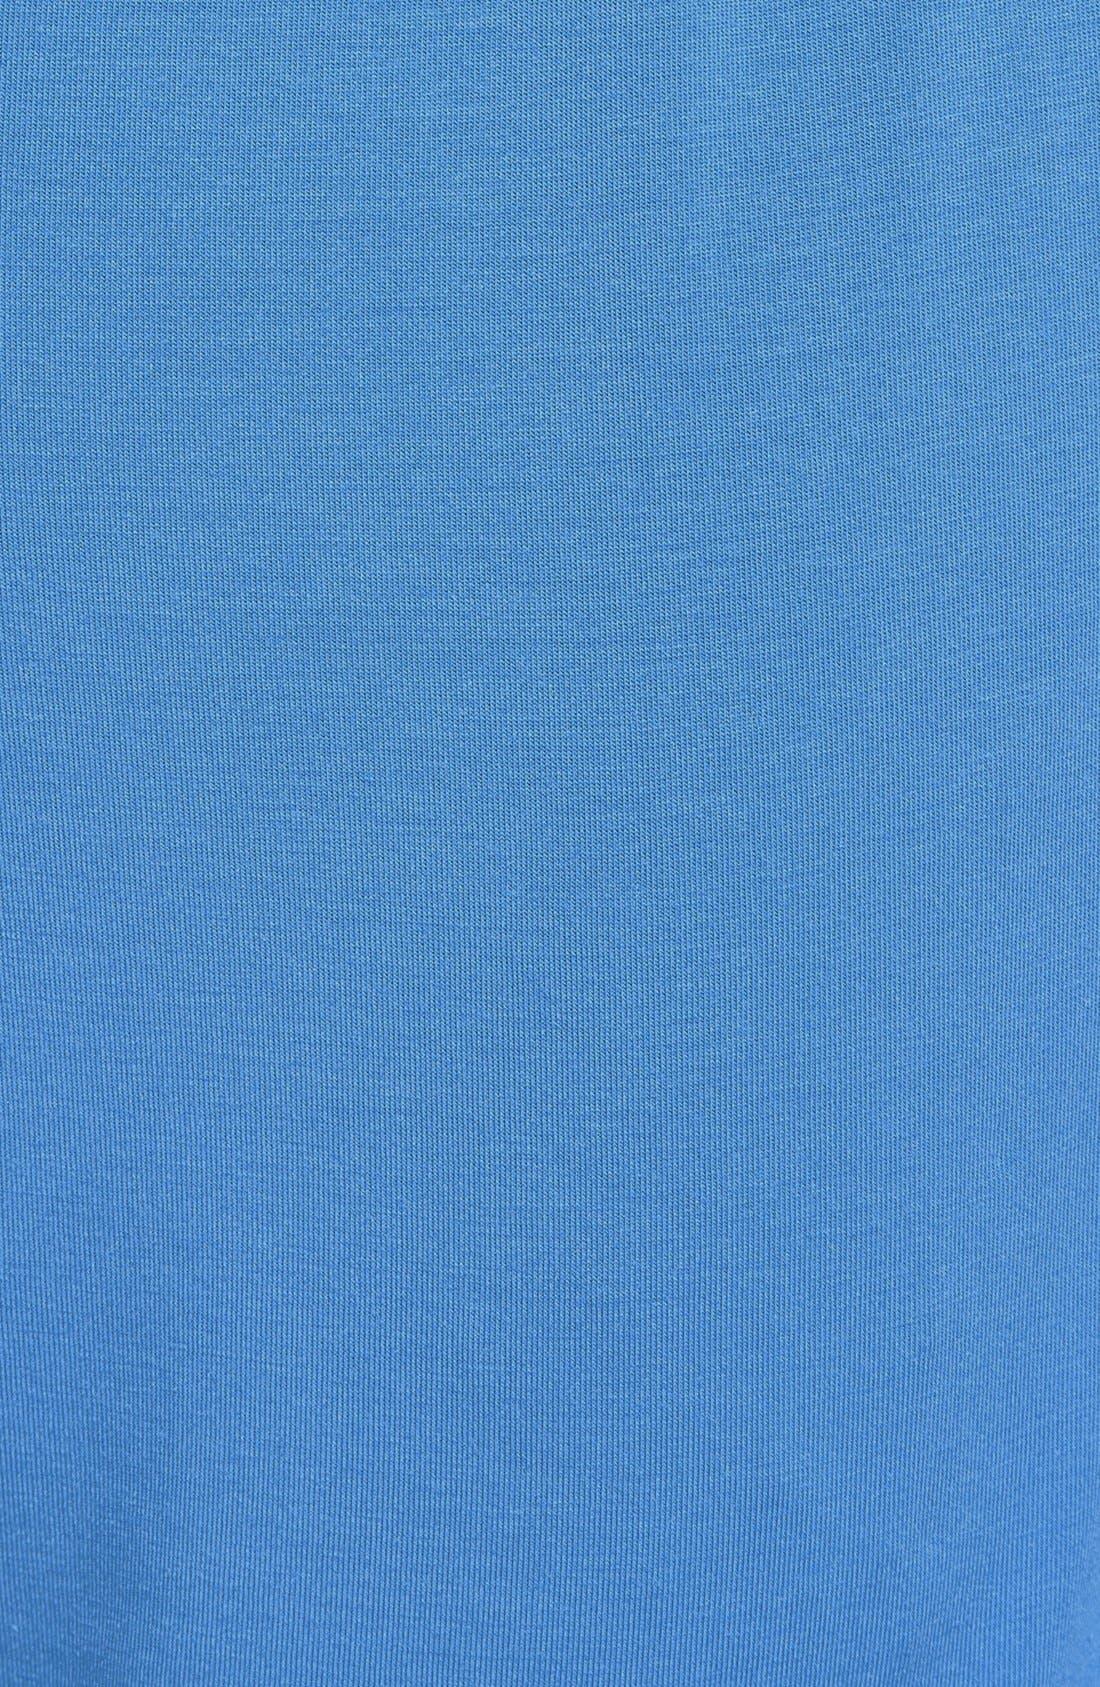 Alternate Image 3  - BOSS HUGO BOSS 'Innovation 2' Lounge Shorts